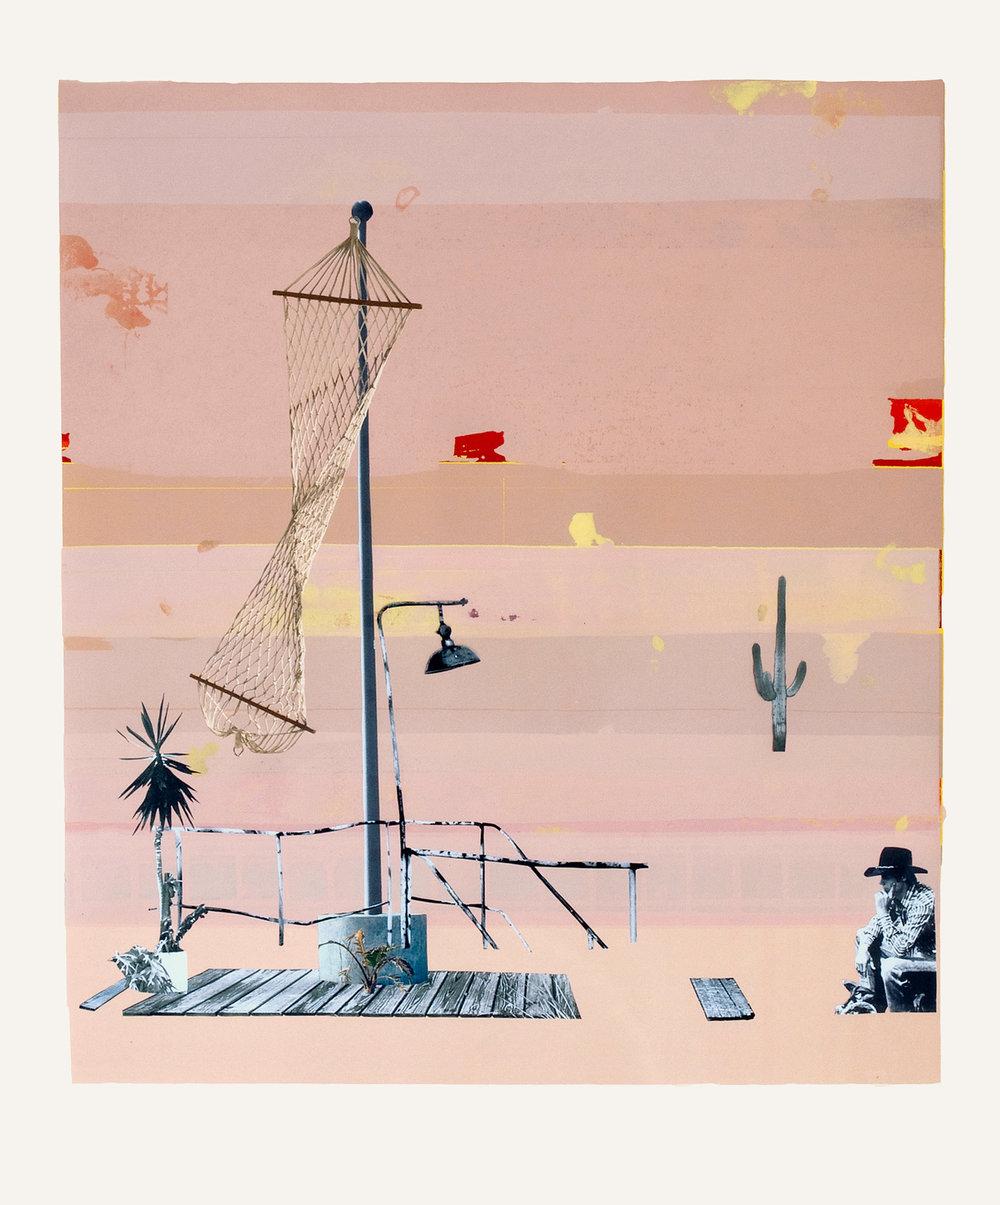 o.T.  Collage, 90cm x 70cm, 2011